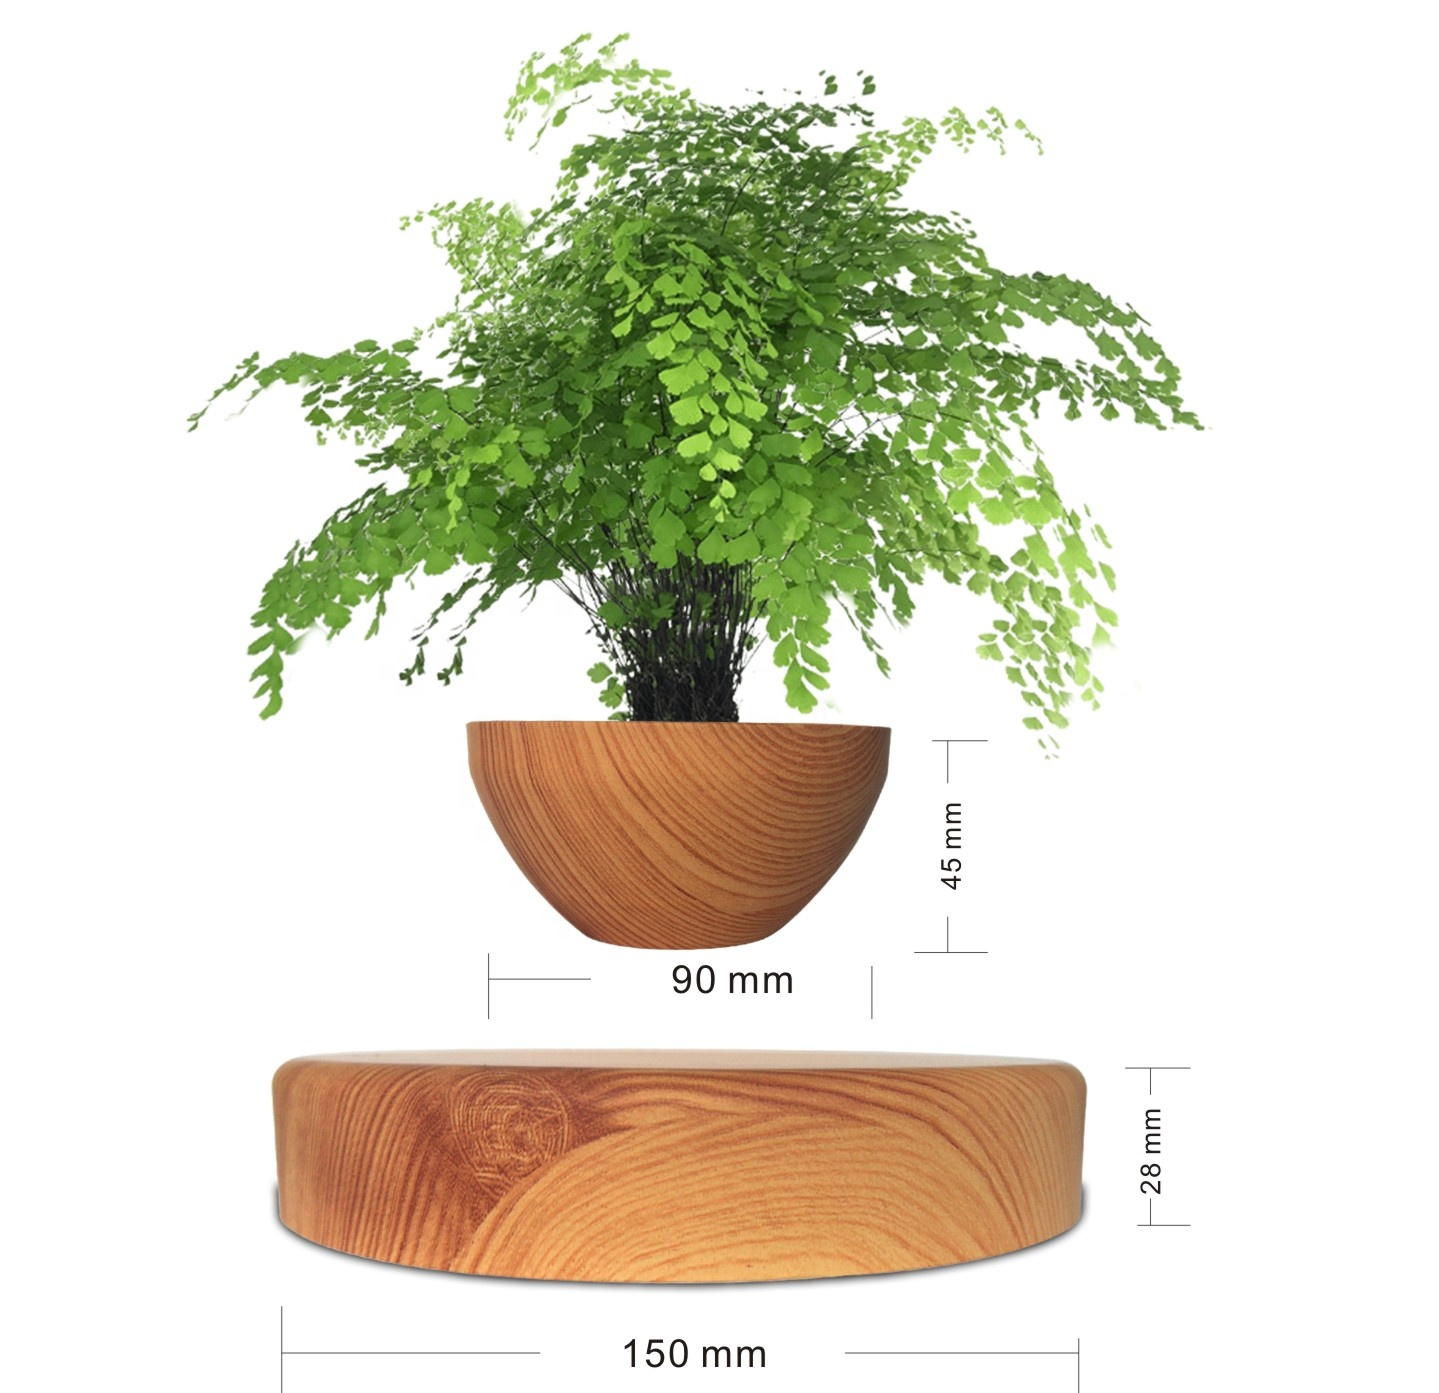 plantenpot 2